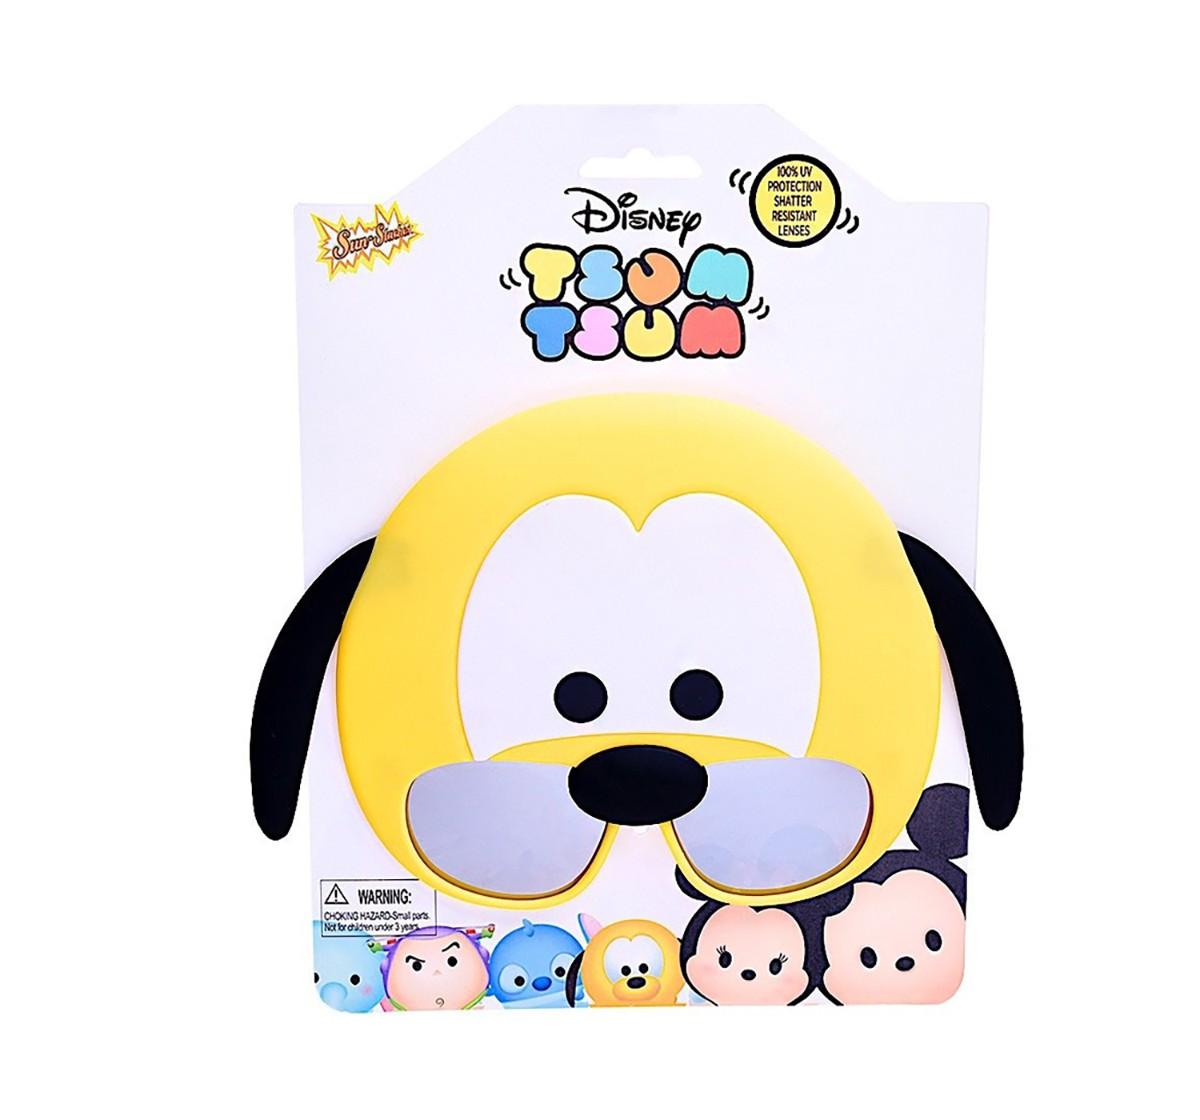 Disney Sun-Staches Costume Sunglasses Tsum Tsum Pluto Party Favors Uv400 Novelty for Kids age 12M+